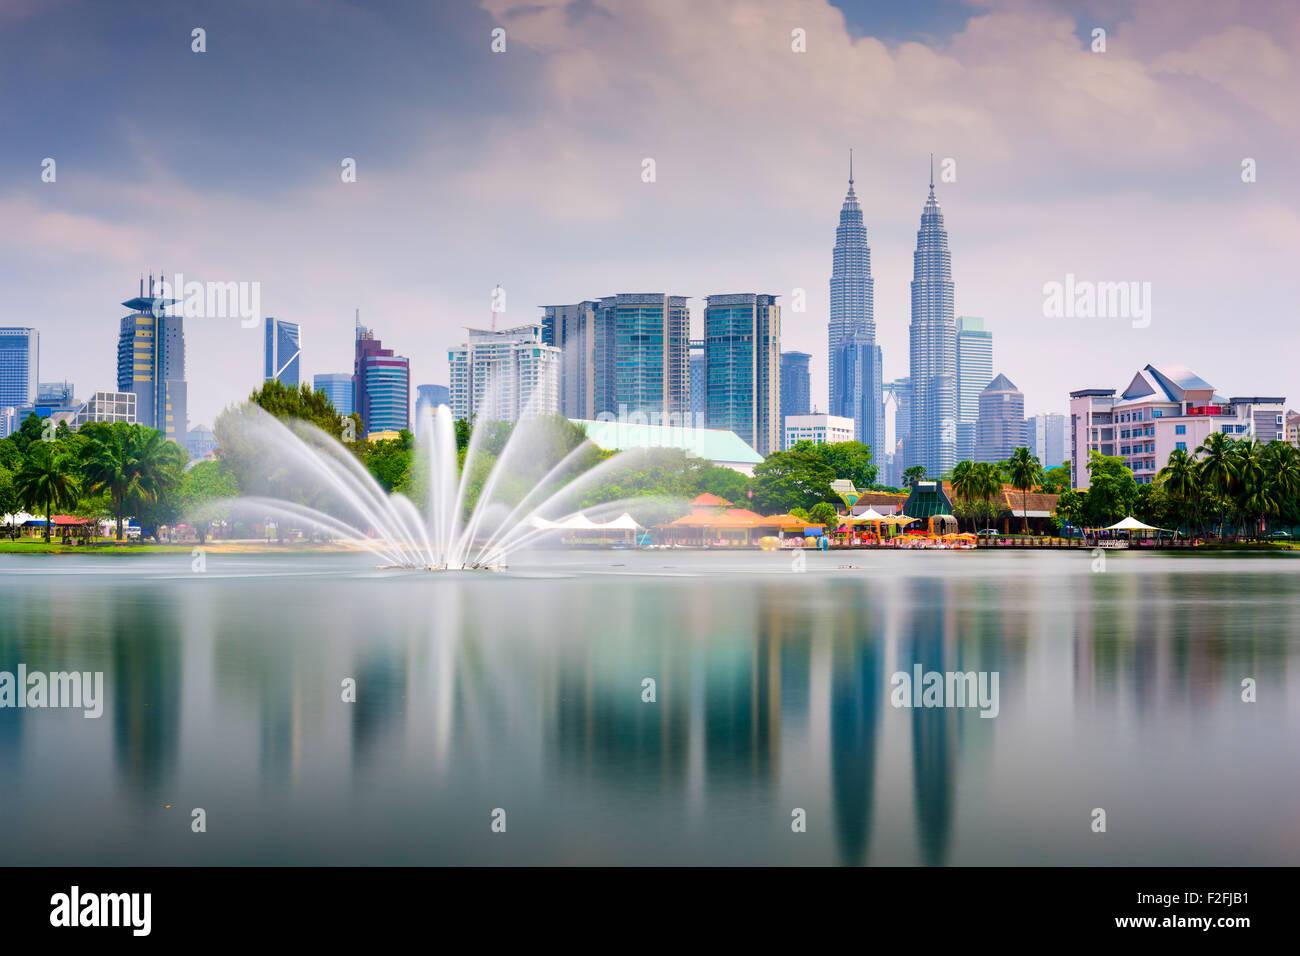 Kuala Lumpur, Malasia skyline en Titiwangsa Park. Imagen De Stock